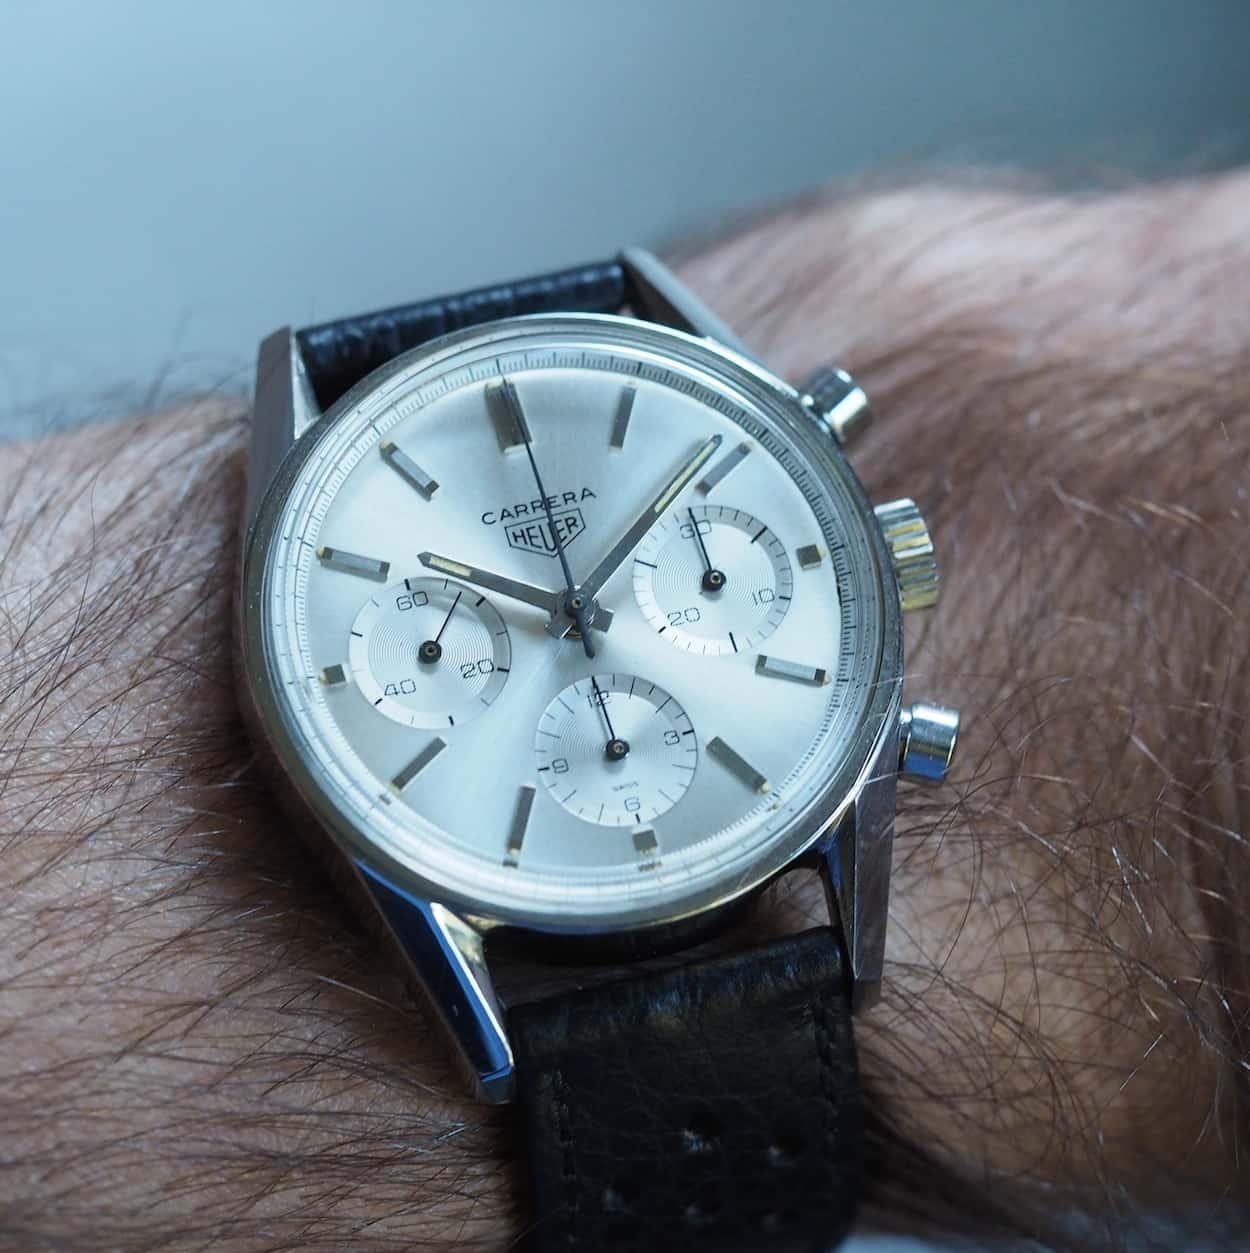 Heuer Carrera 2447S on the wrist